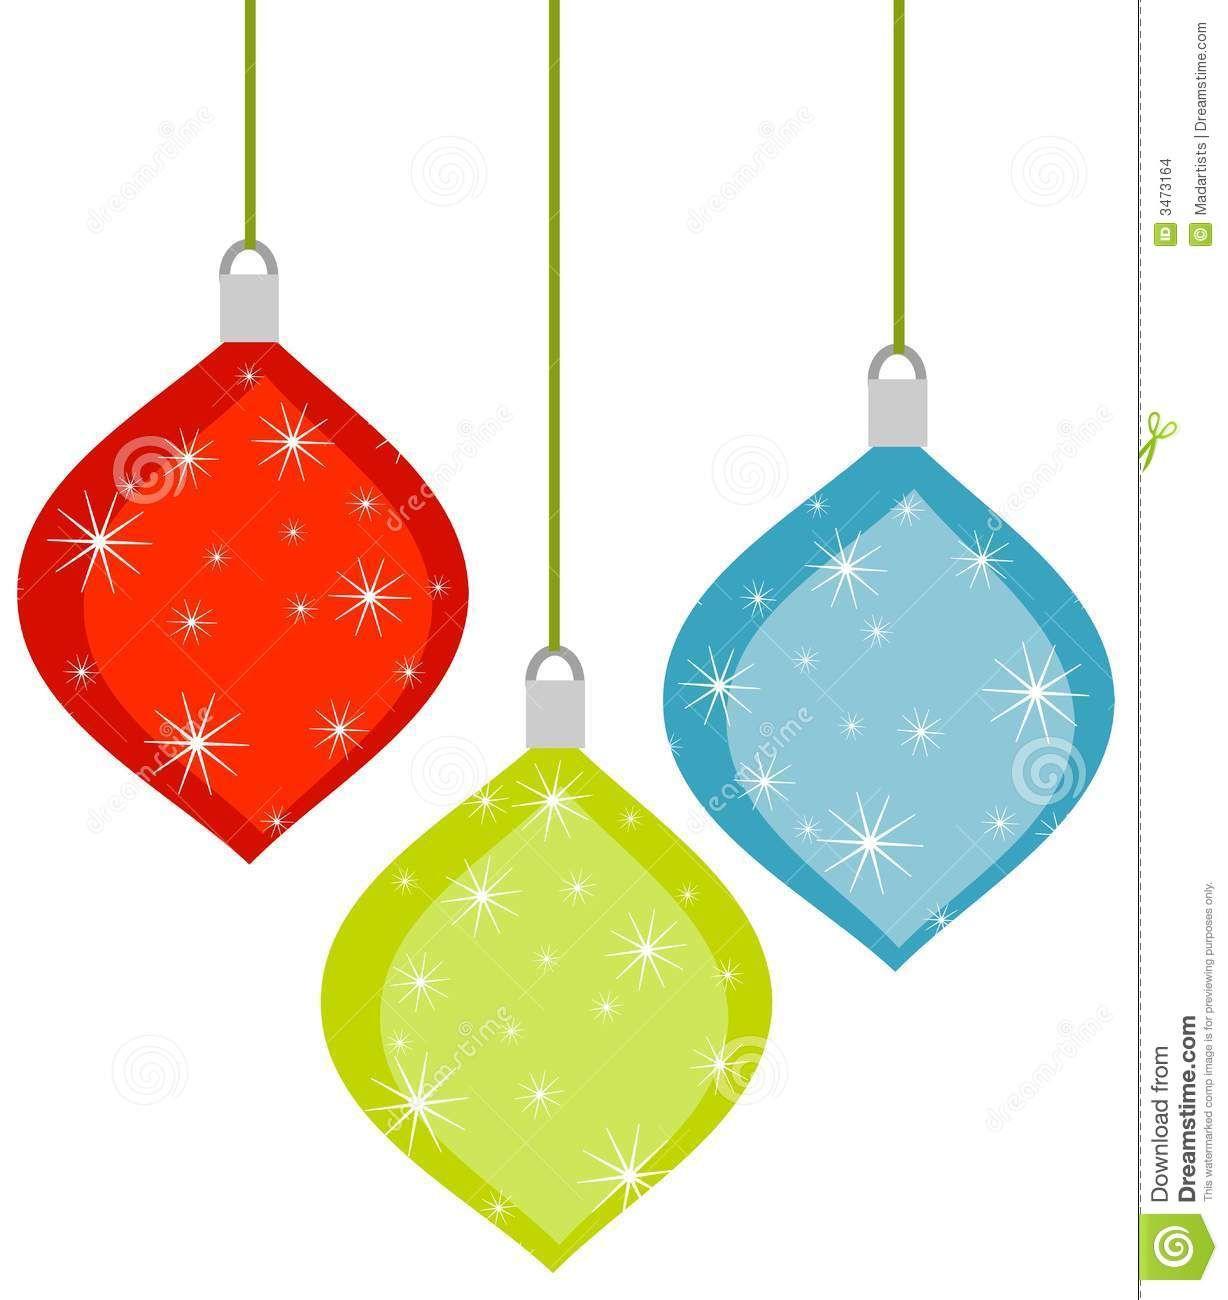 A Clip Art Illustration Of 3 Christmas Ornaments Retro Christmas Christmas Crafts Decorations